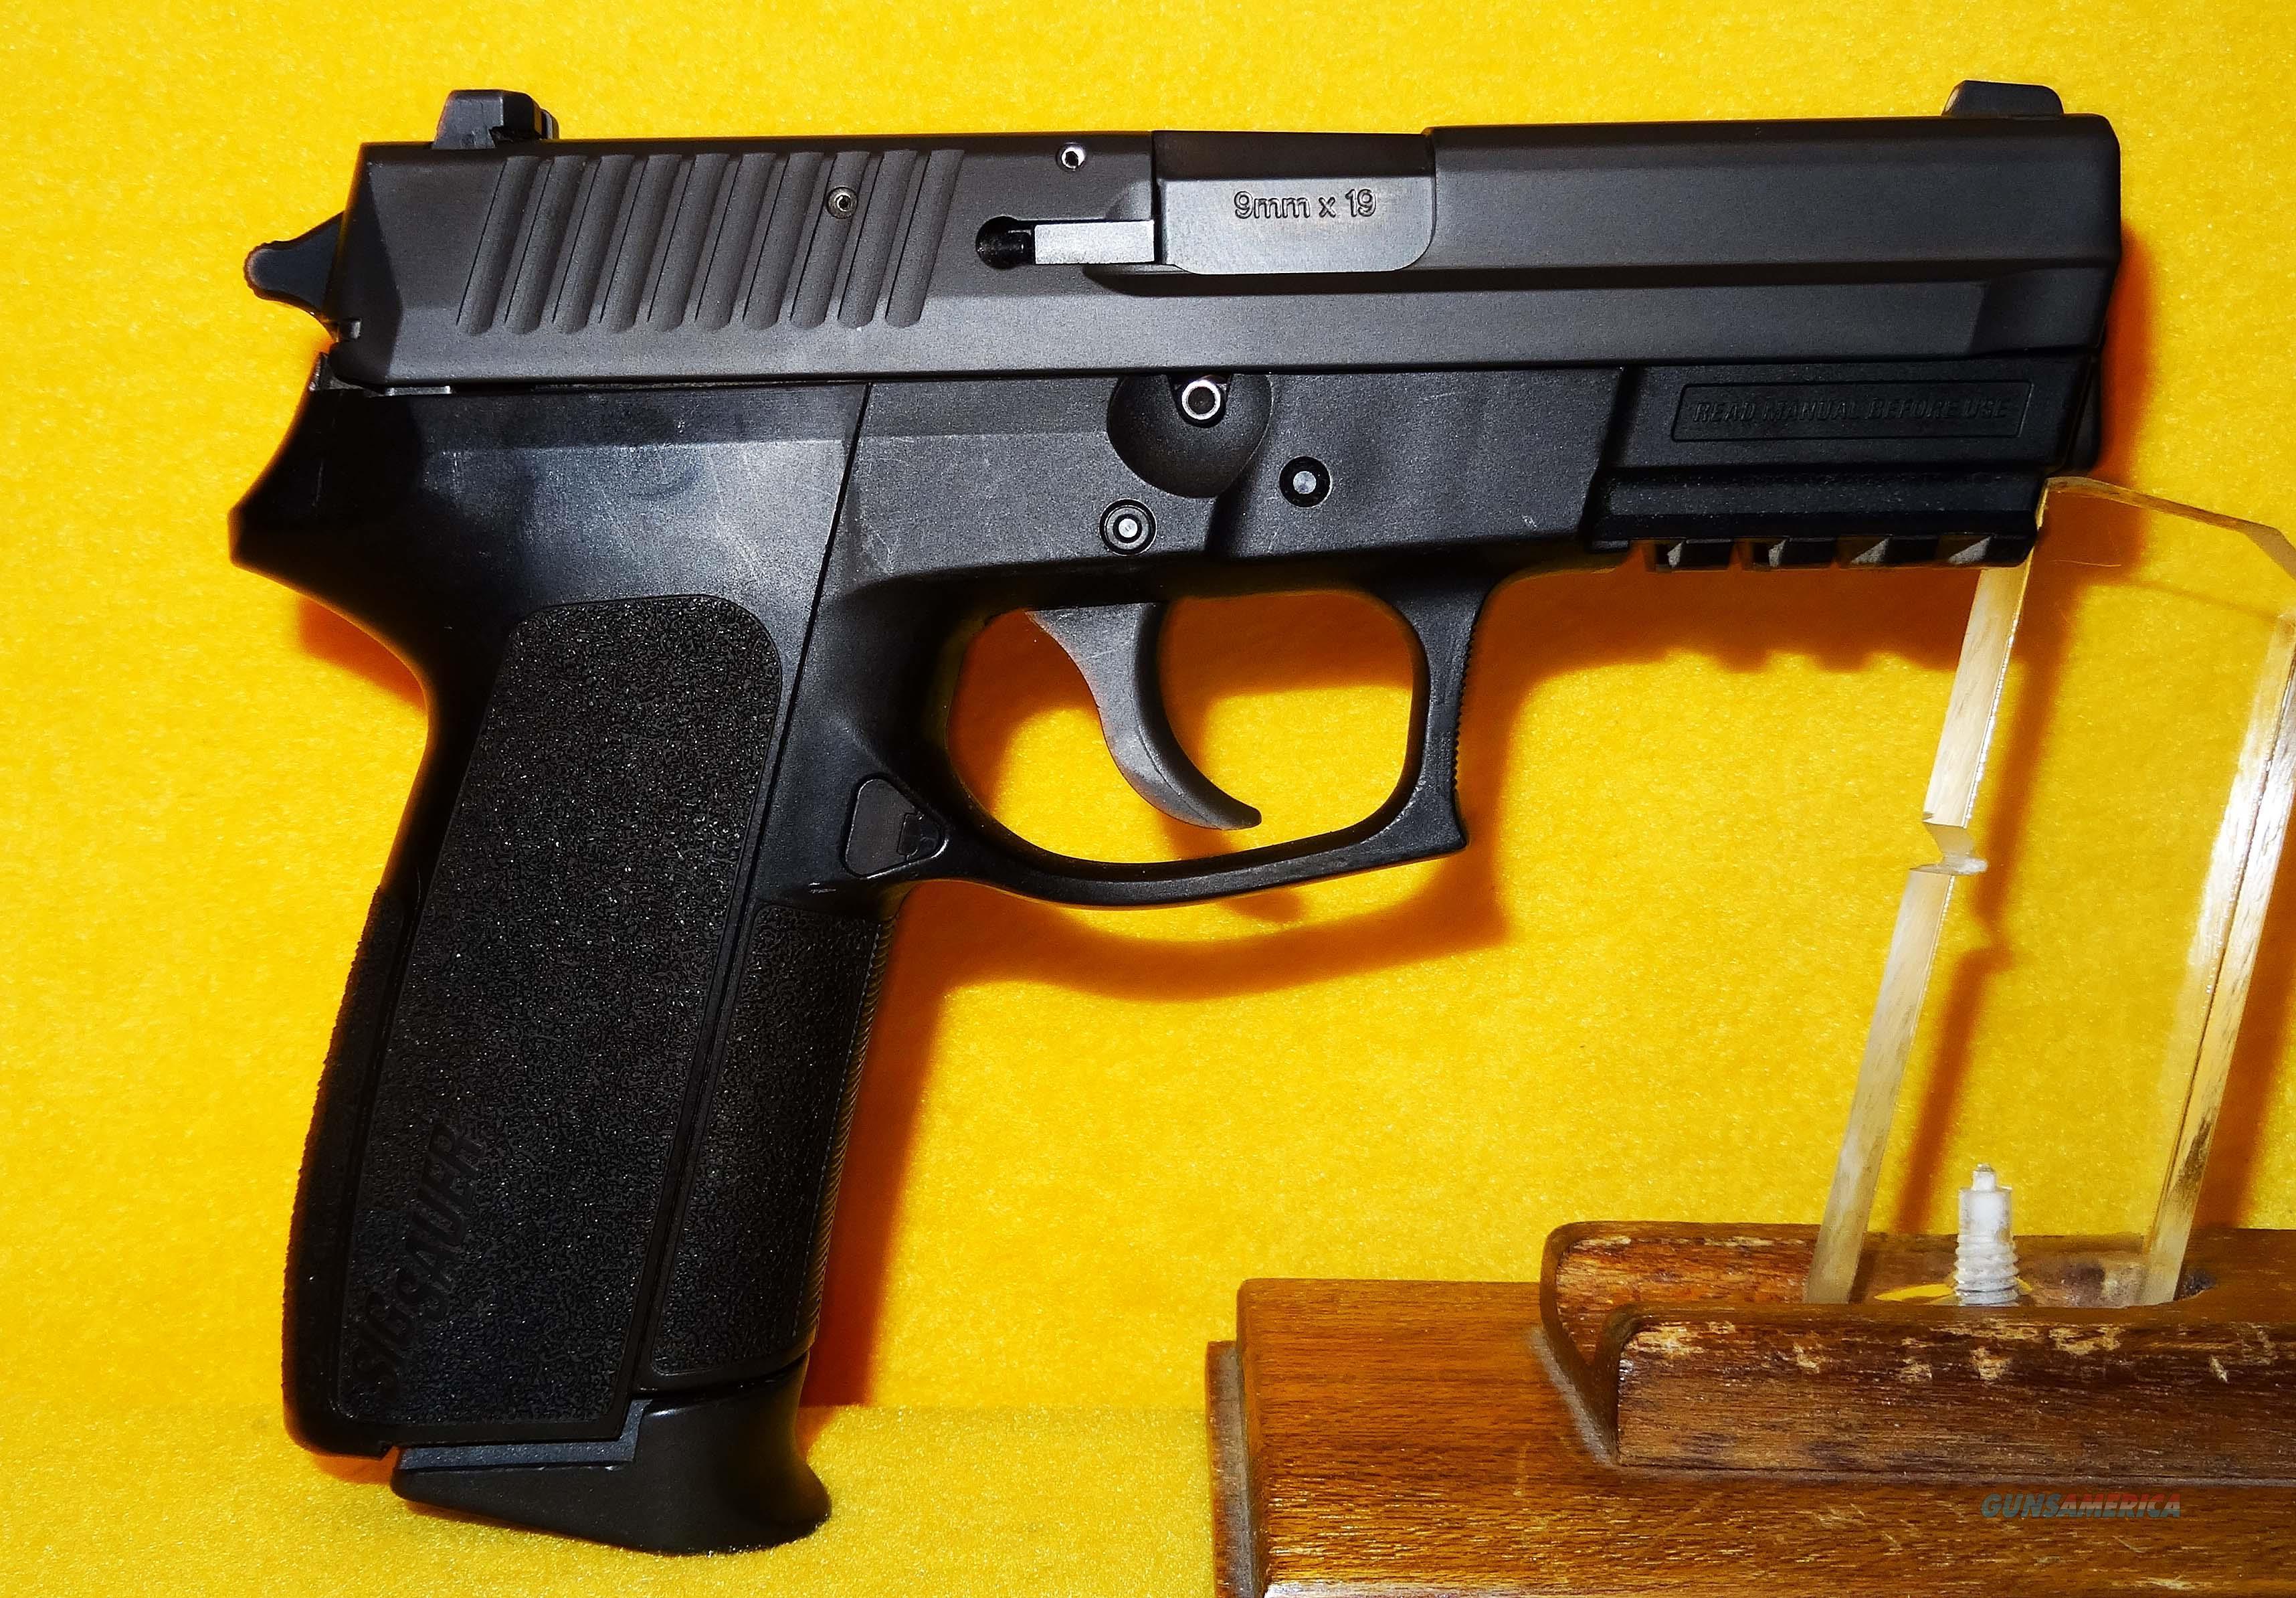 SIG SAUER SP2022  Guns > Pistols > Sig - Sauer/Sigarms Pistols > 2022